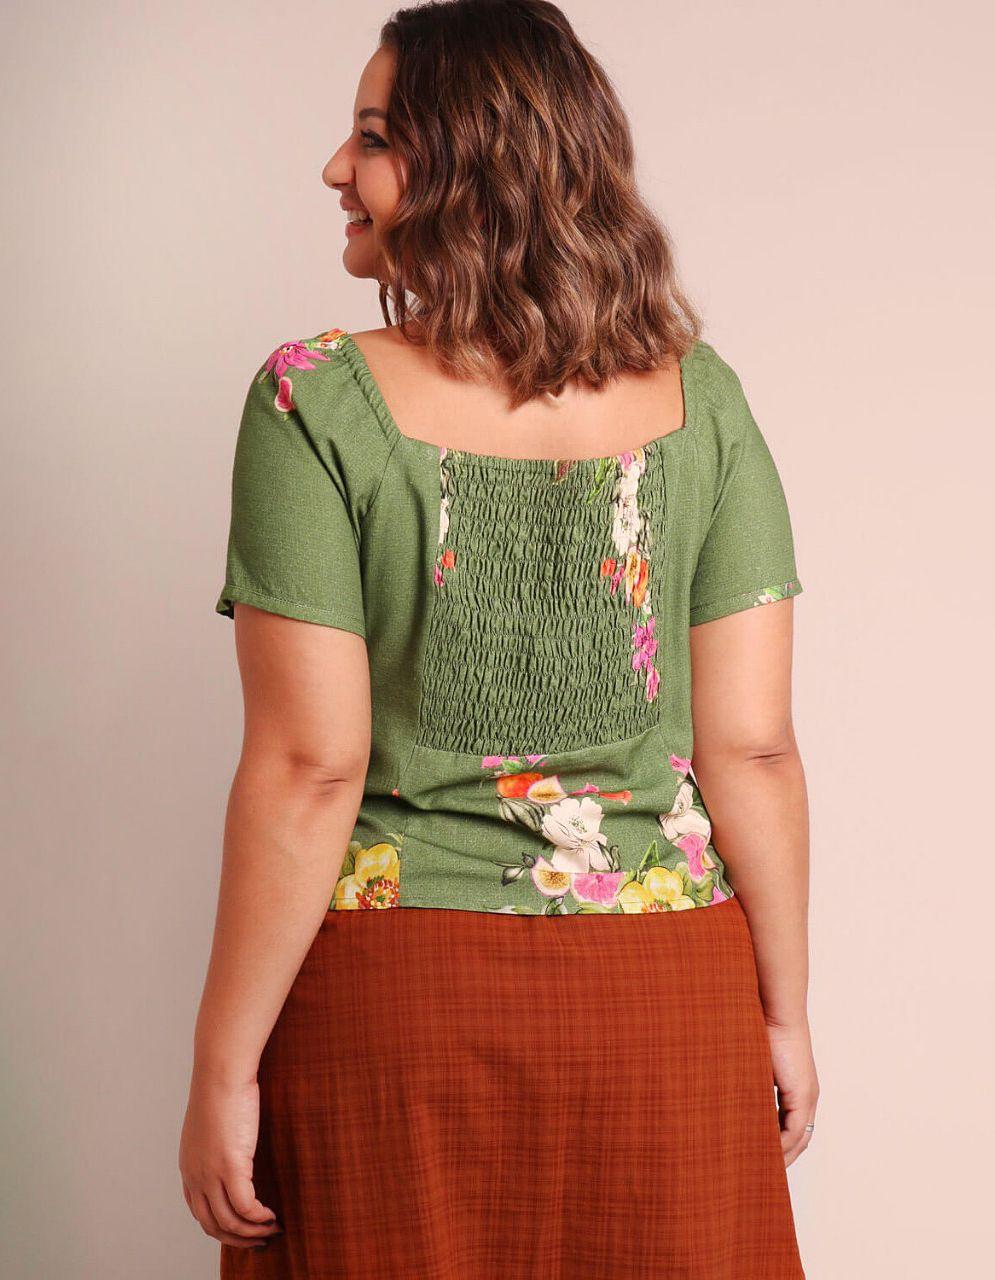 Blusa blanca o verde talla grande verano y manga corta Malagueta-57470MAL-B